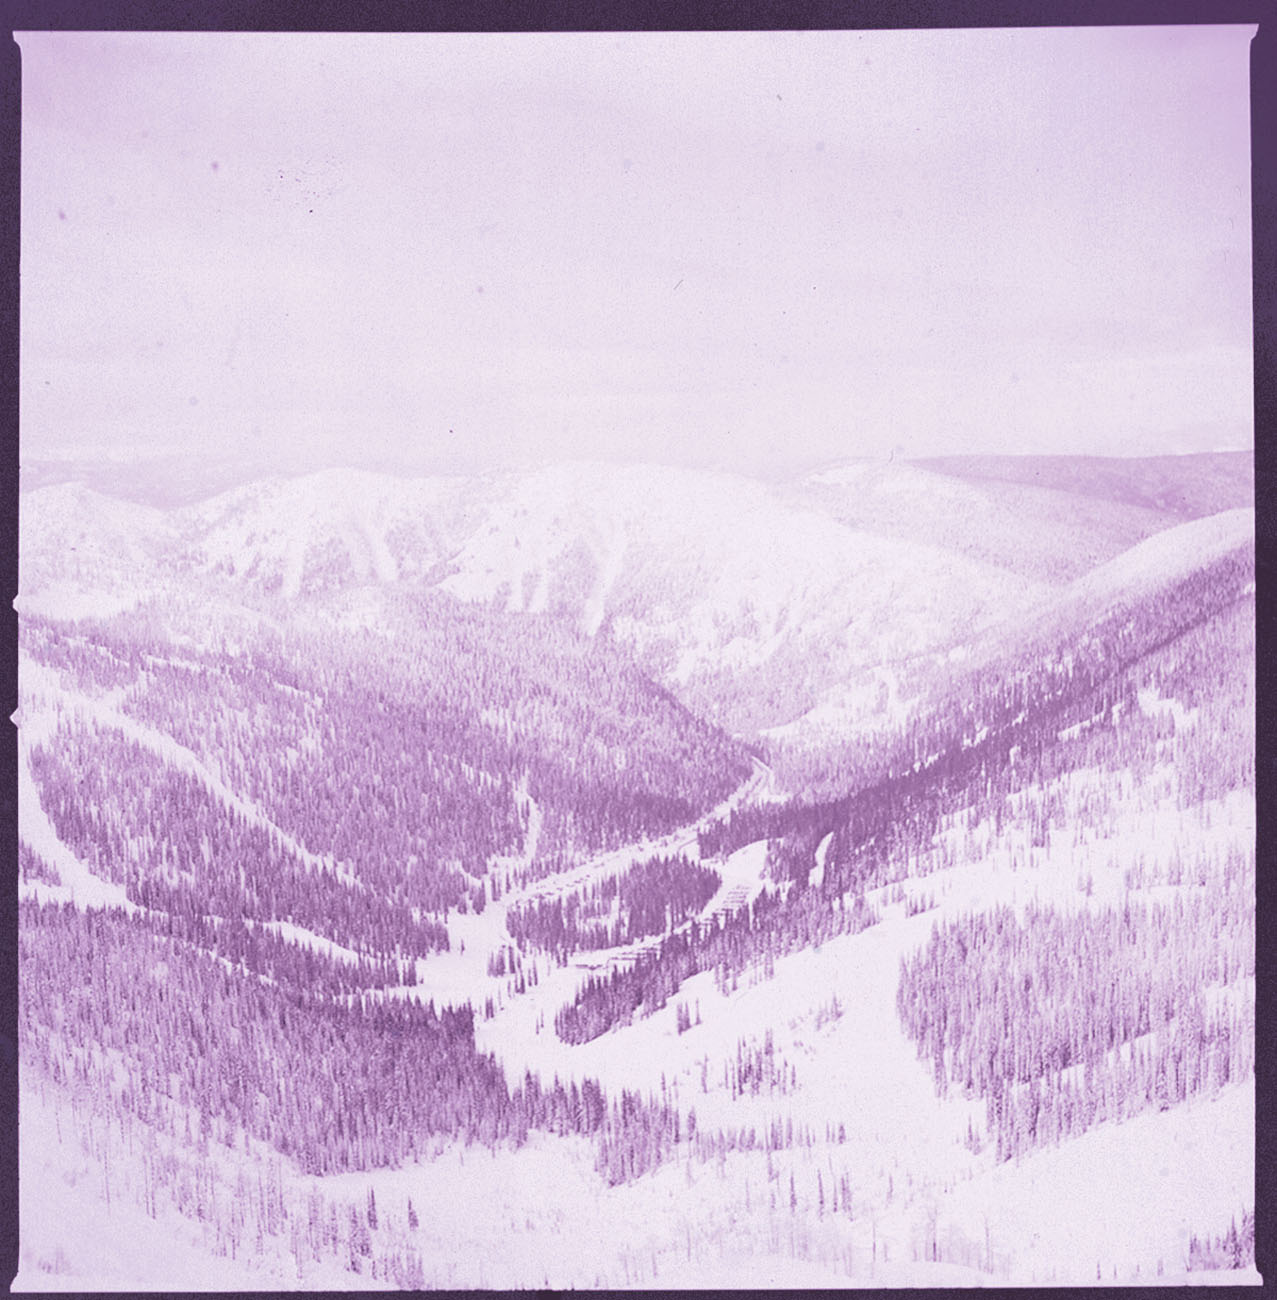 Whitewater Ski Resort by Lindsey Ross